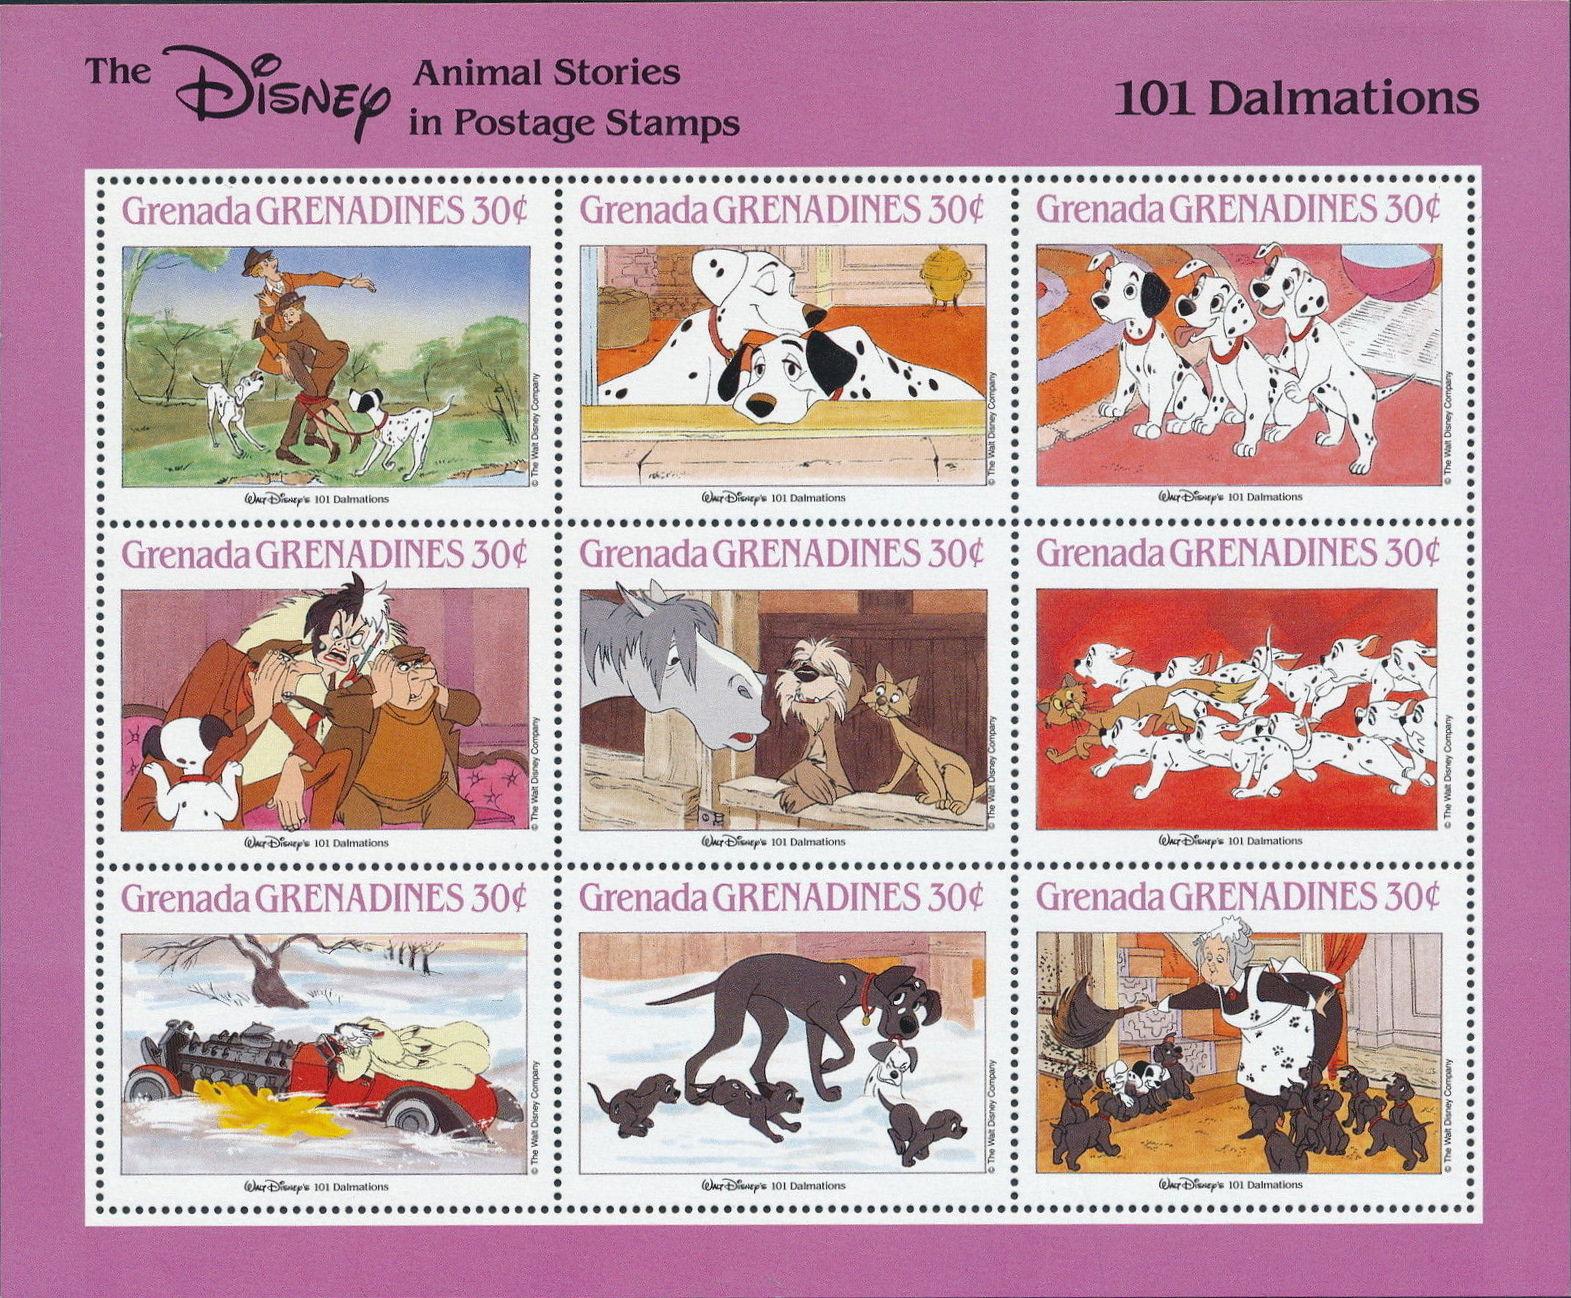 Grenada Grenadines 1988 The Disney Animal Stories in Postage Stamps SSc.jpg